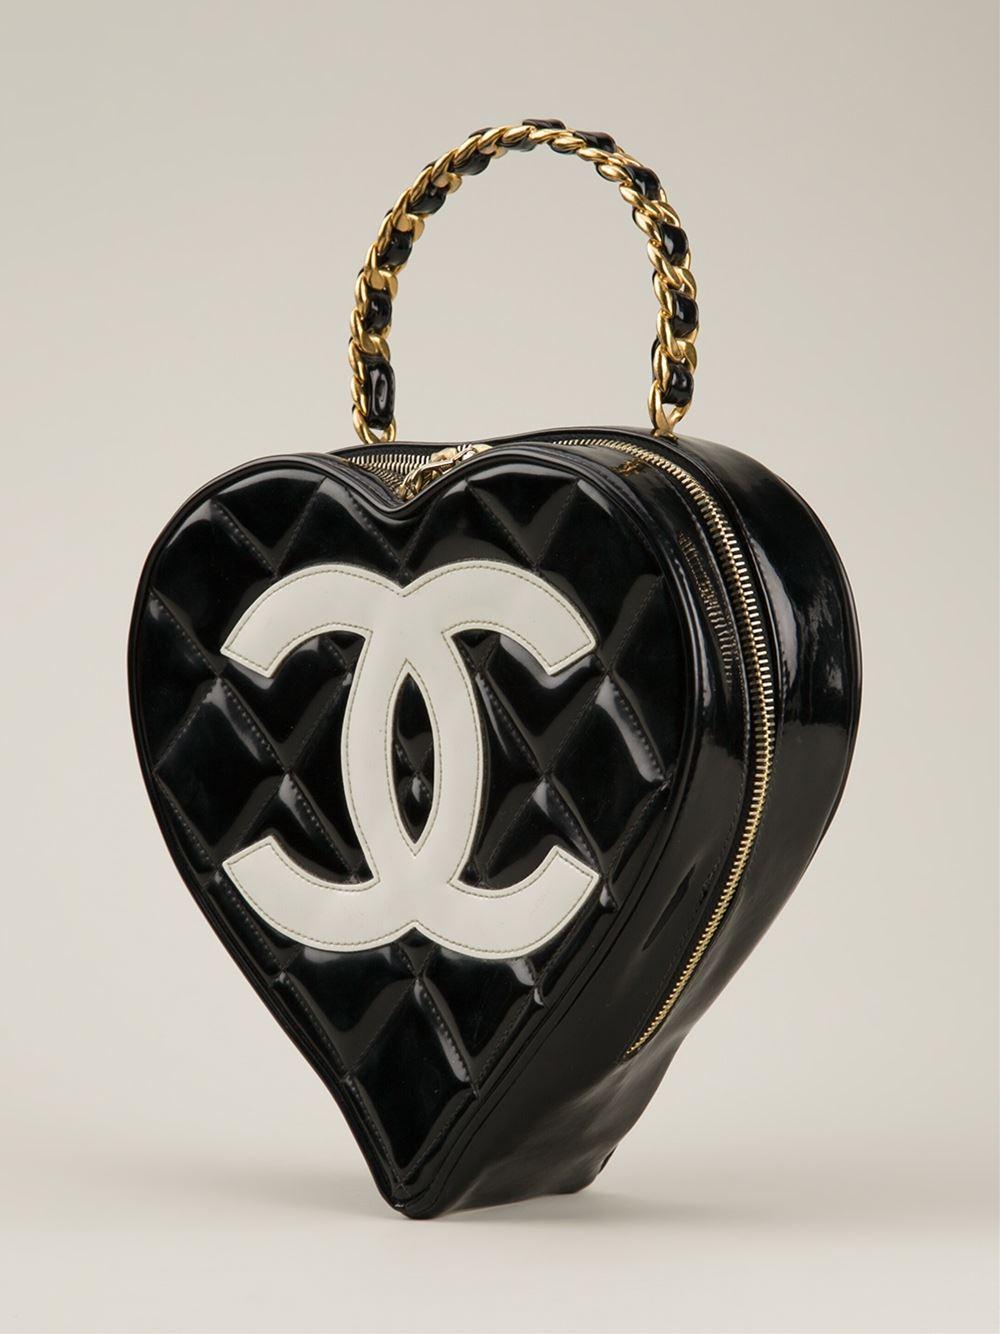 Splurge Du Jour Chanel Vintage Heart Shaped Tote